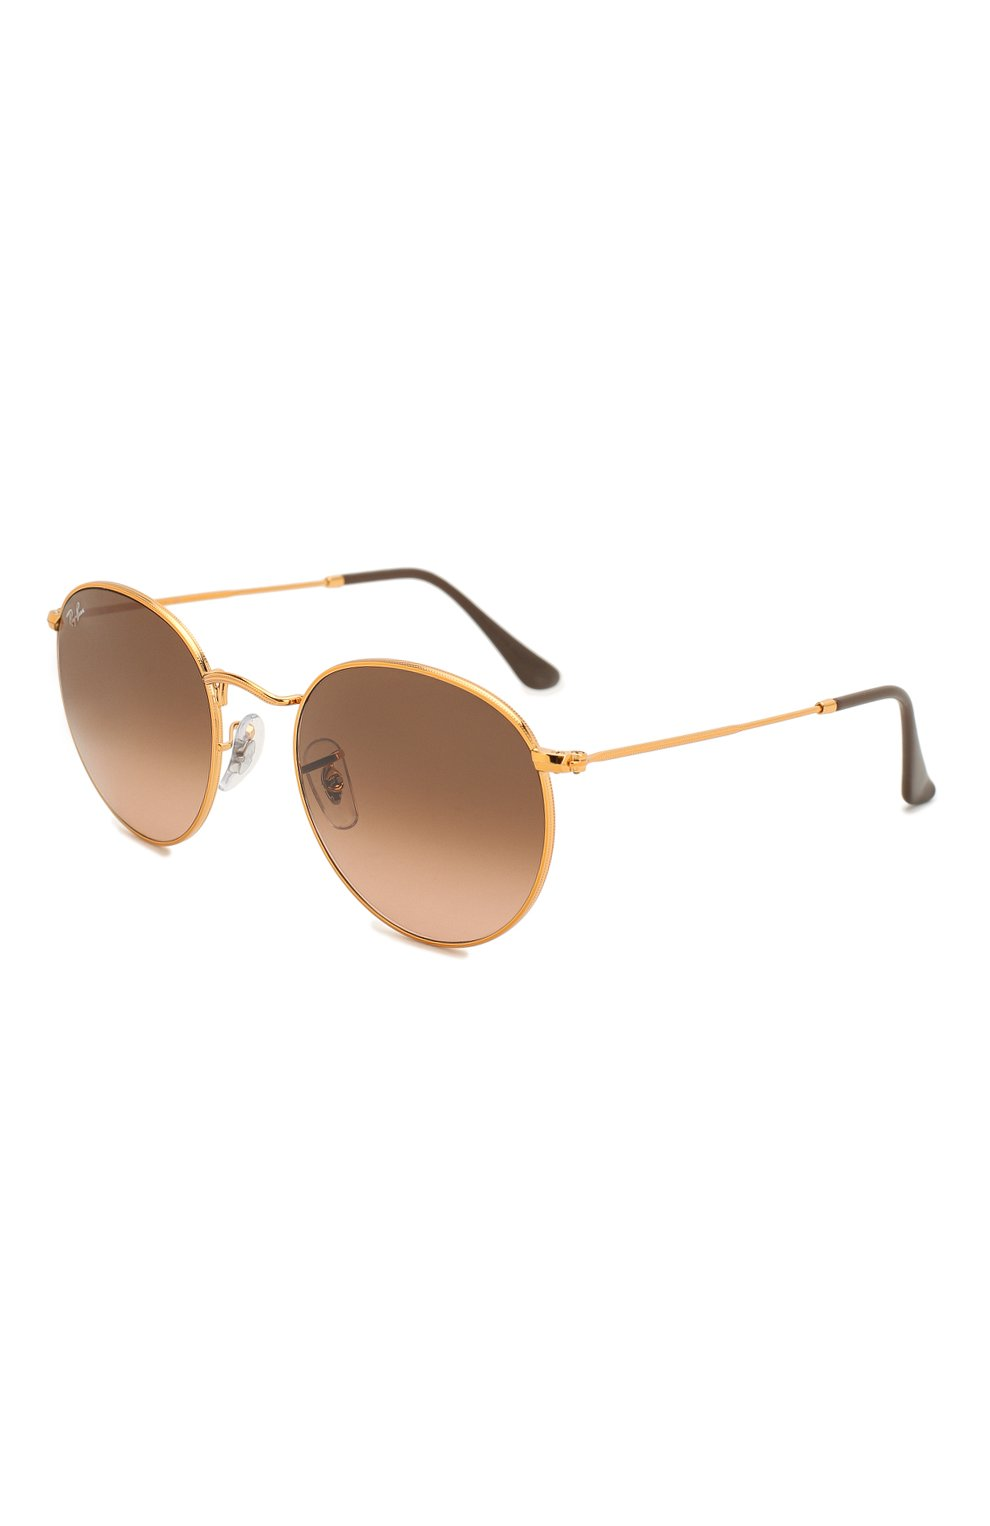 c4c2404f7775 Солнцезащитные очки